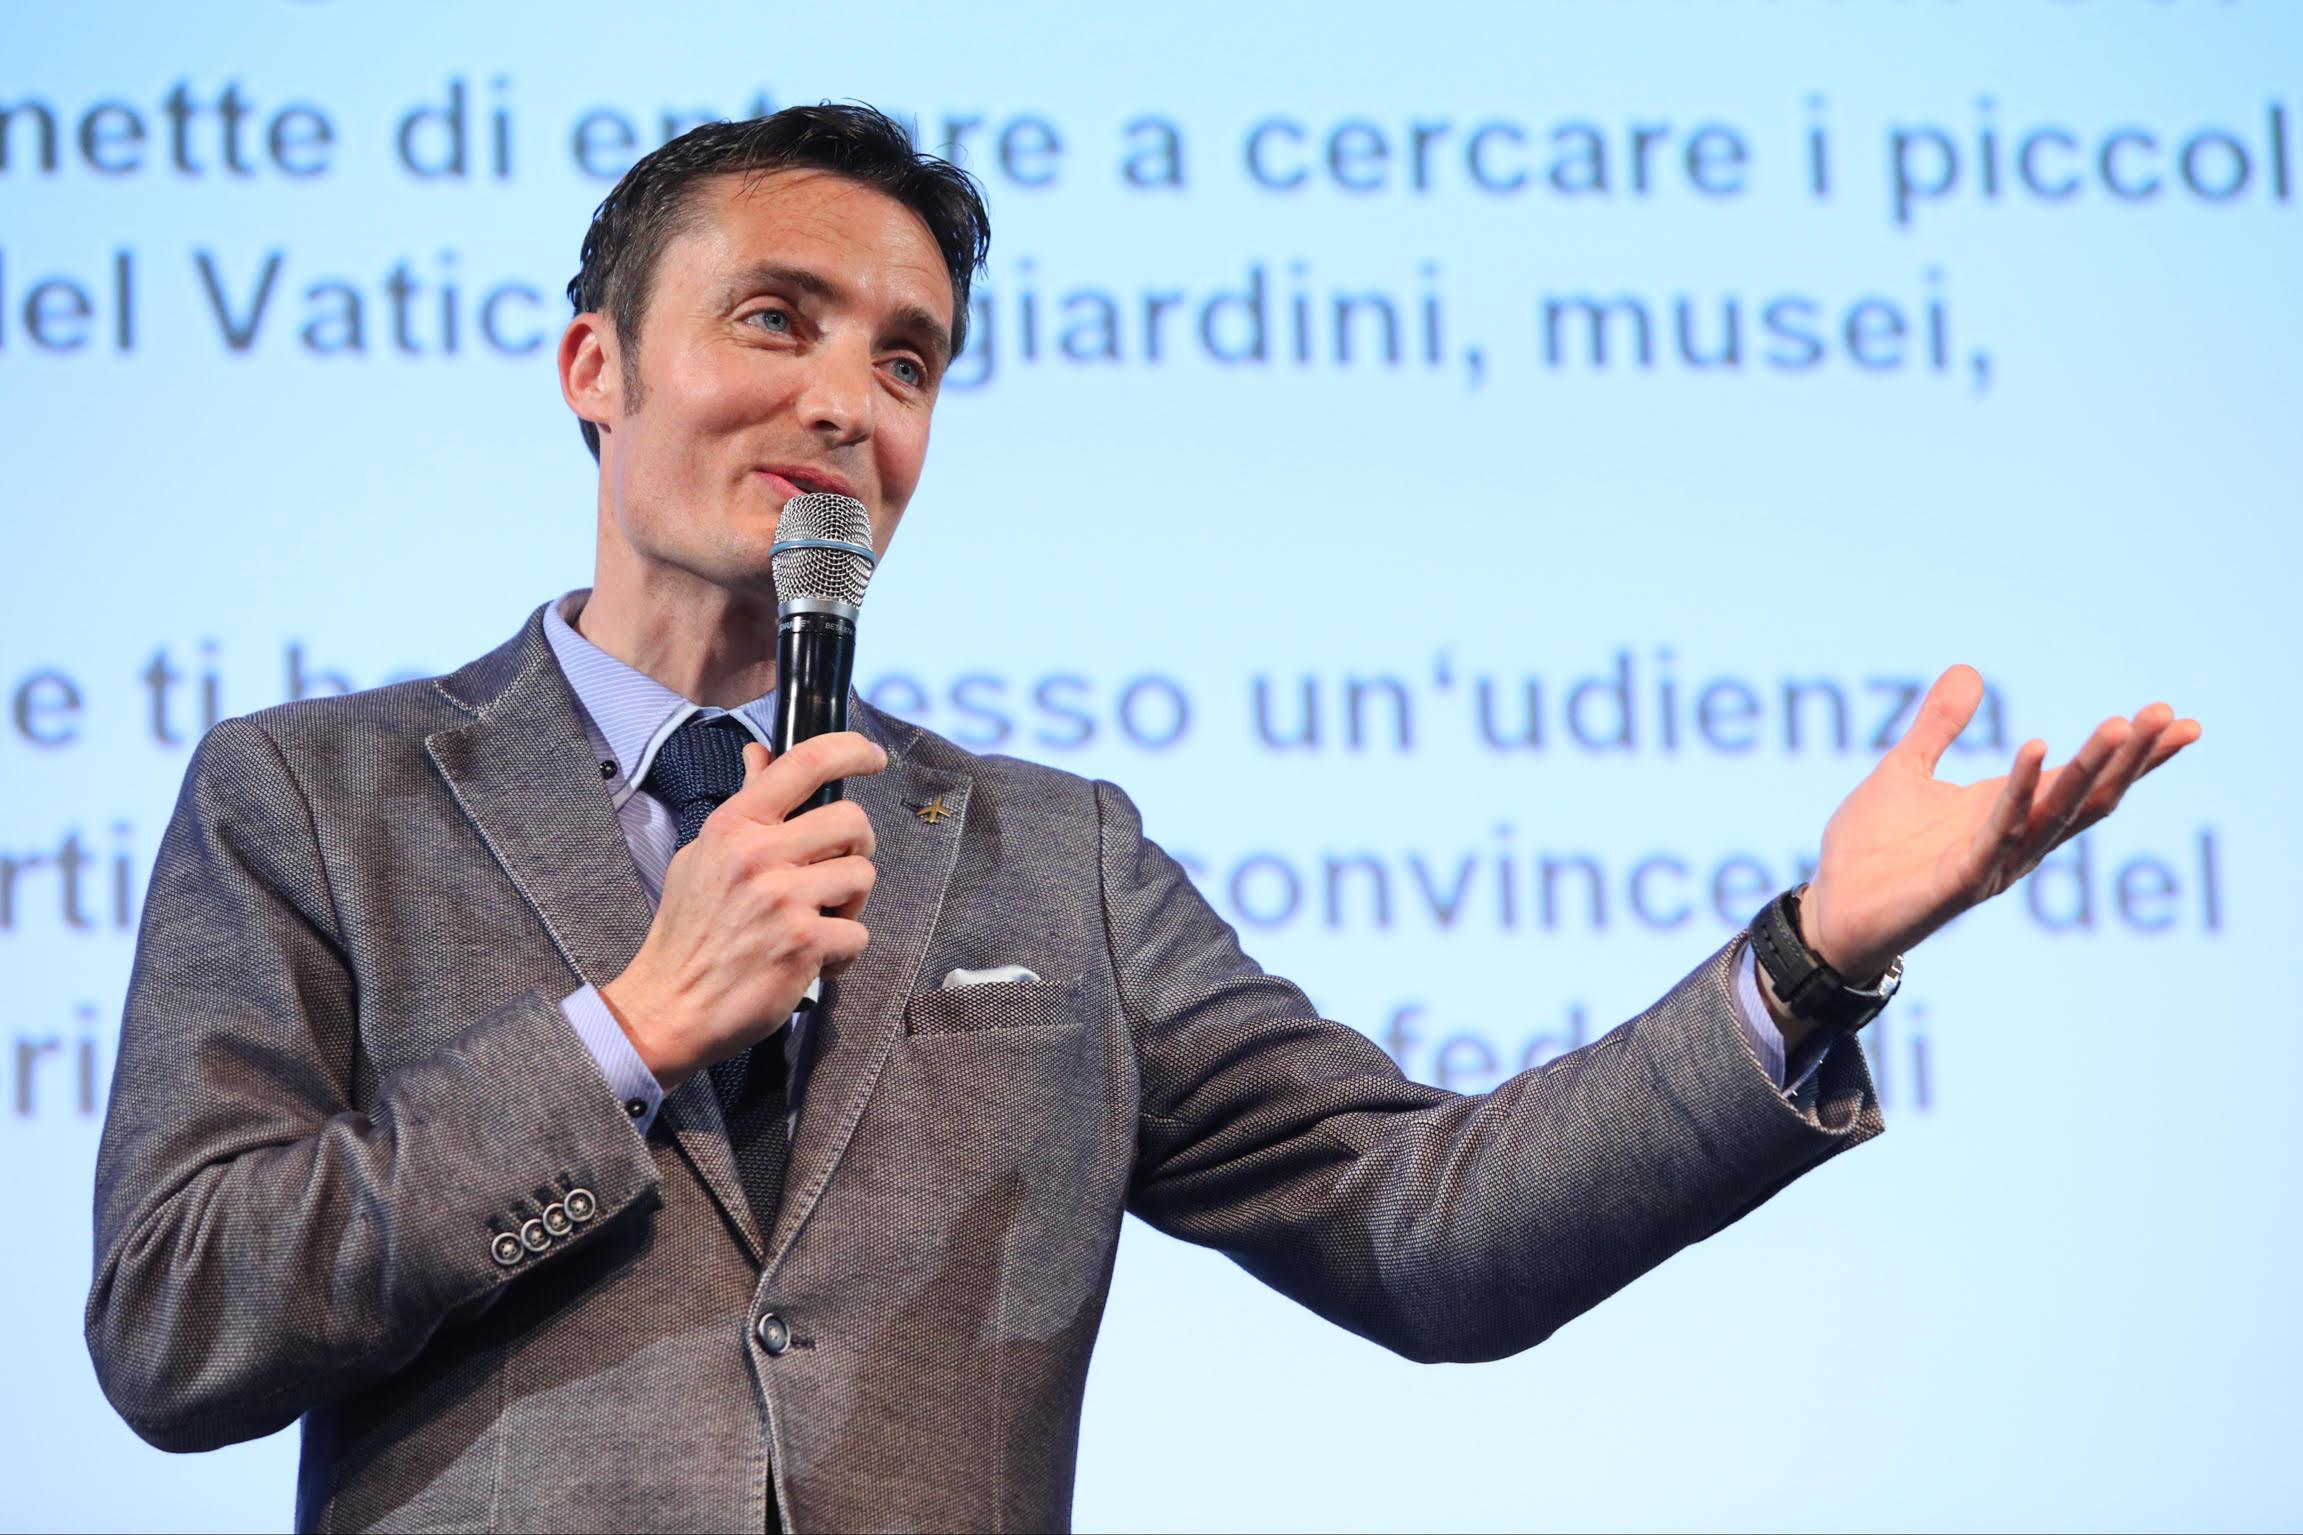 [:de]Moderation_Marco Di Sapia[:]